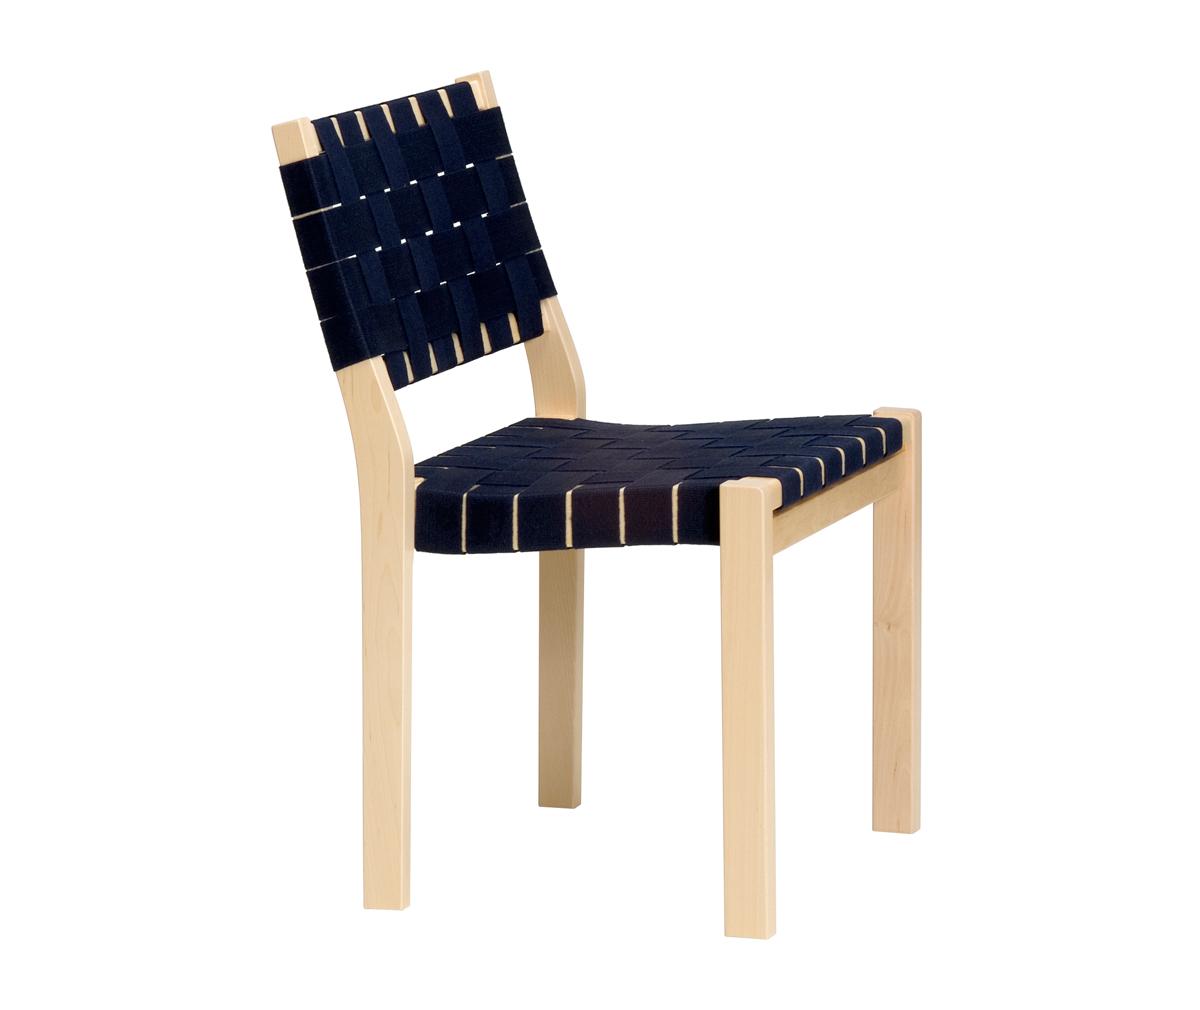 Artek 611 satulavy tuoli koivu musta veps l inen for Sedia 611 artek